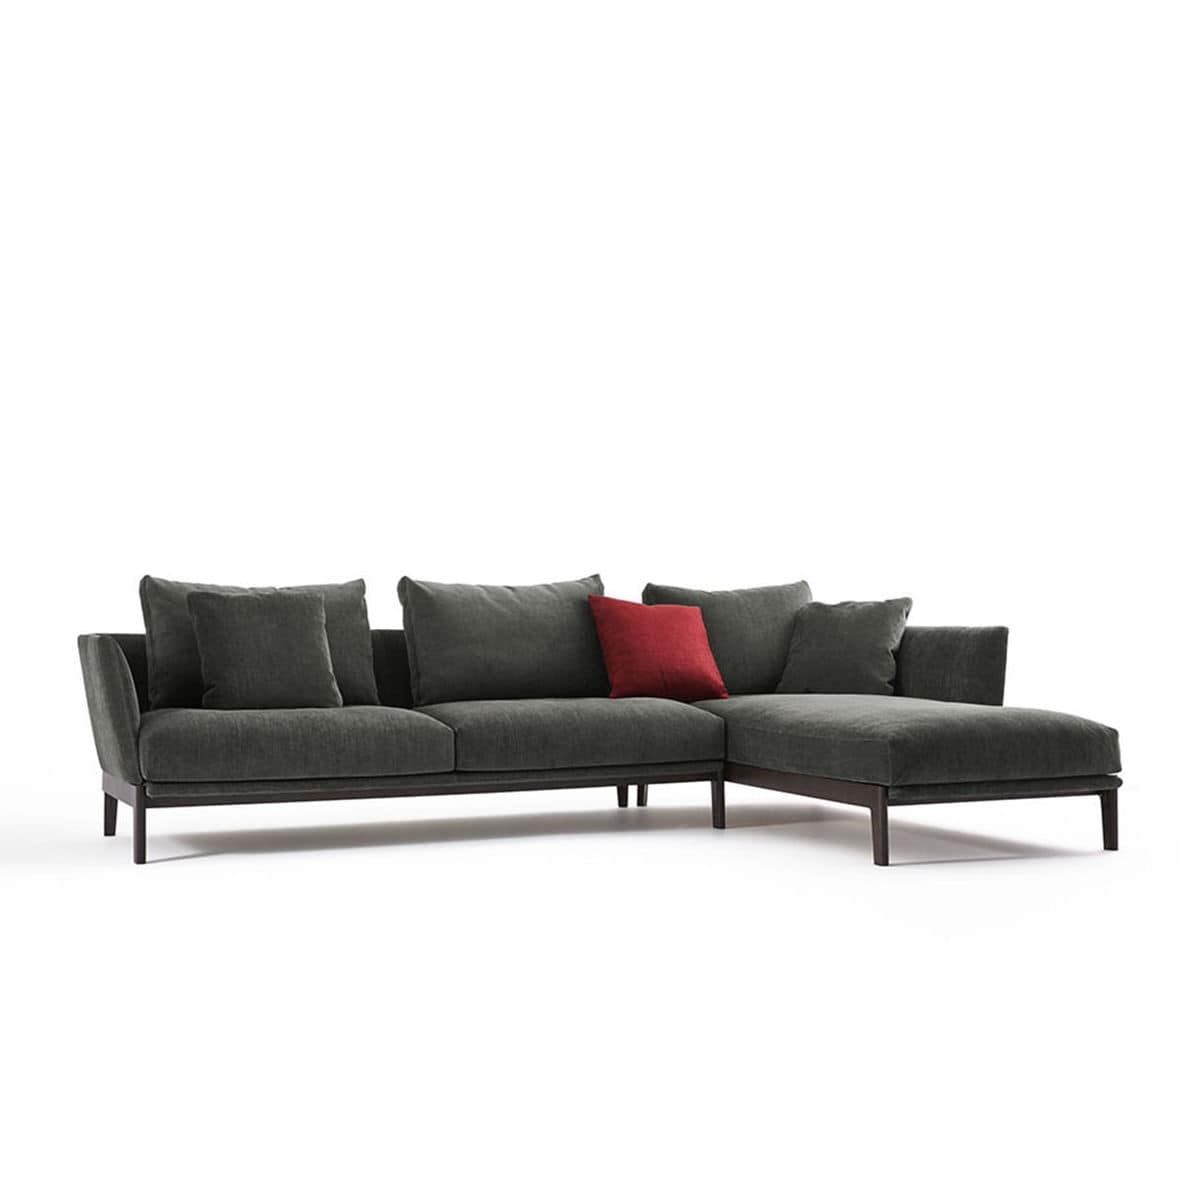 Modulierbares Sofa / modern / Leder / Stoff - CHELSEA - Molteni & C